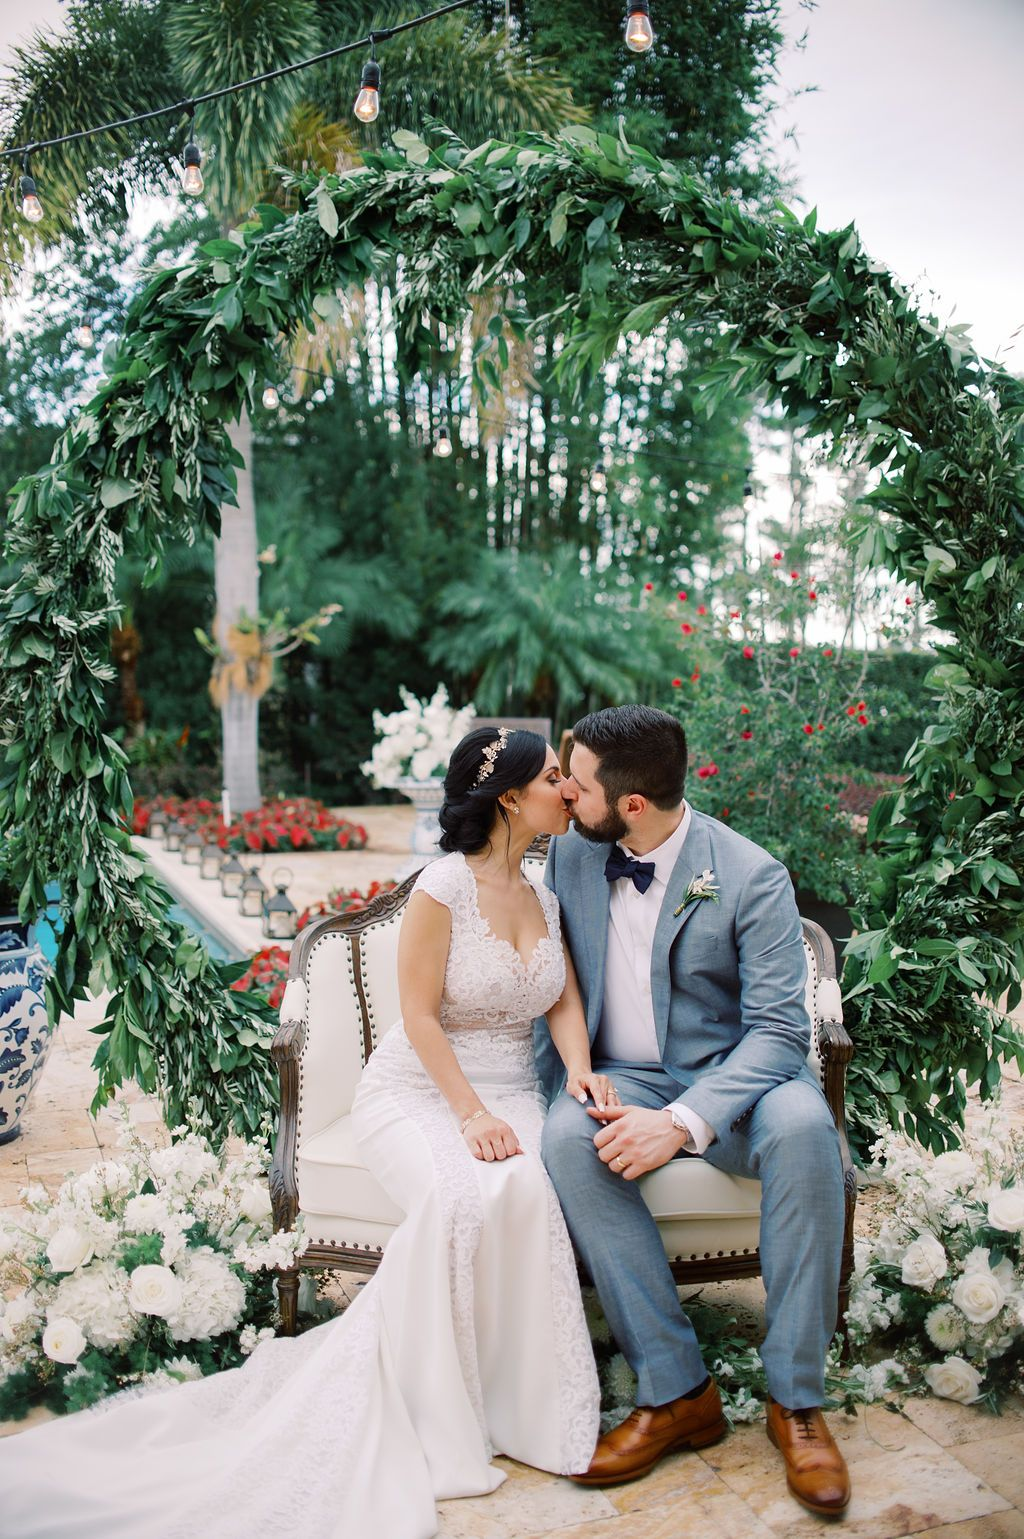 Spanish Inspired Wedding Between Two Law Graduates Ruffled In 2020 Elegant Backyard Wedding Wedding Ceremony Traditions Wedding Inspiration